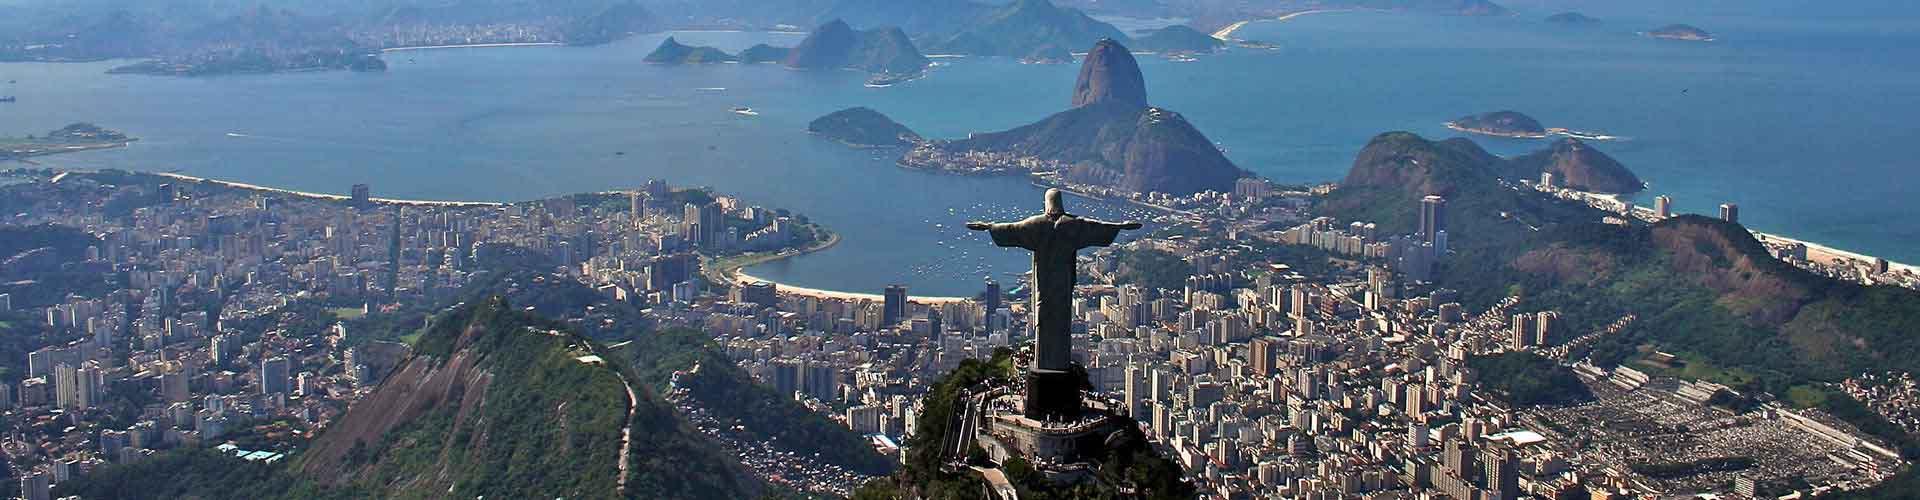 Rio de Janeiro - pokoje v blízkosti Santos Dumont Letiště. Mapy pro Rio de Janeiro, fotky a recenze pro každý pokoj - Rio de Janeiro.